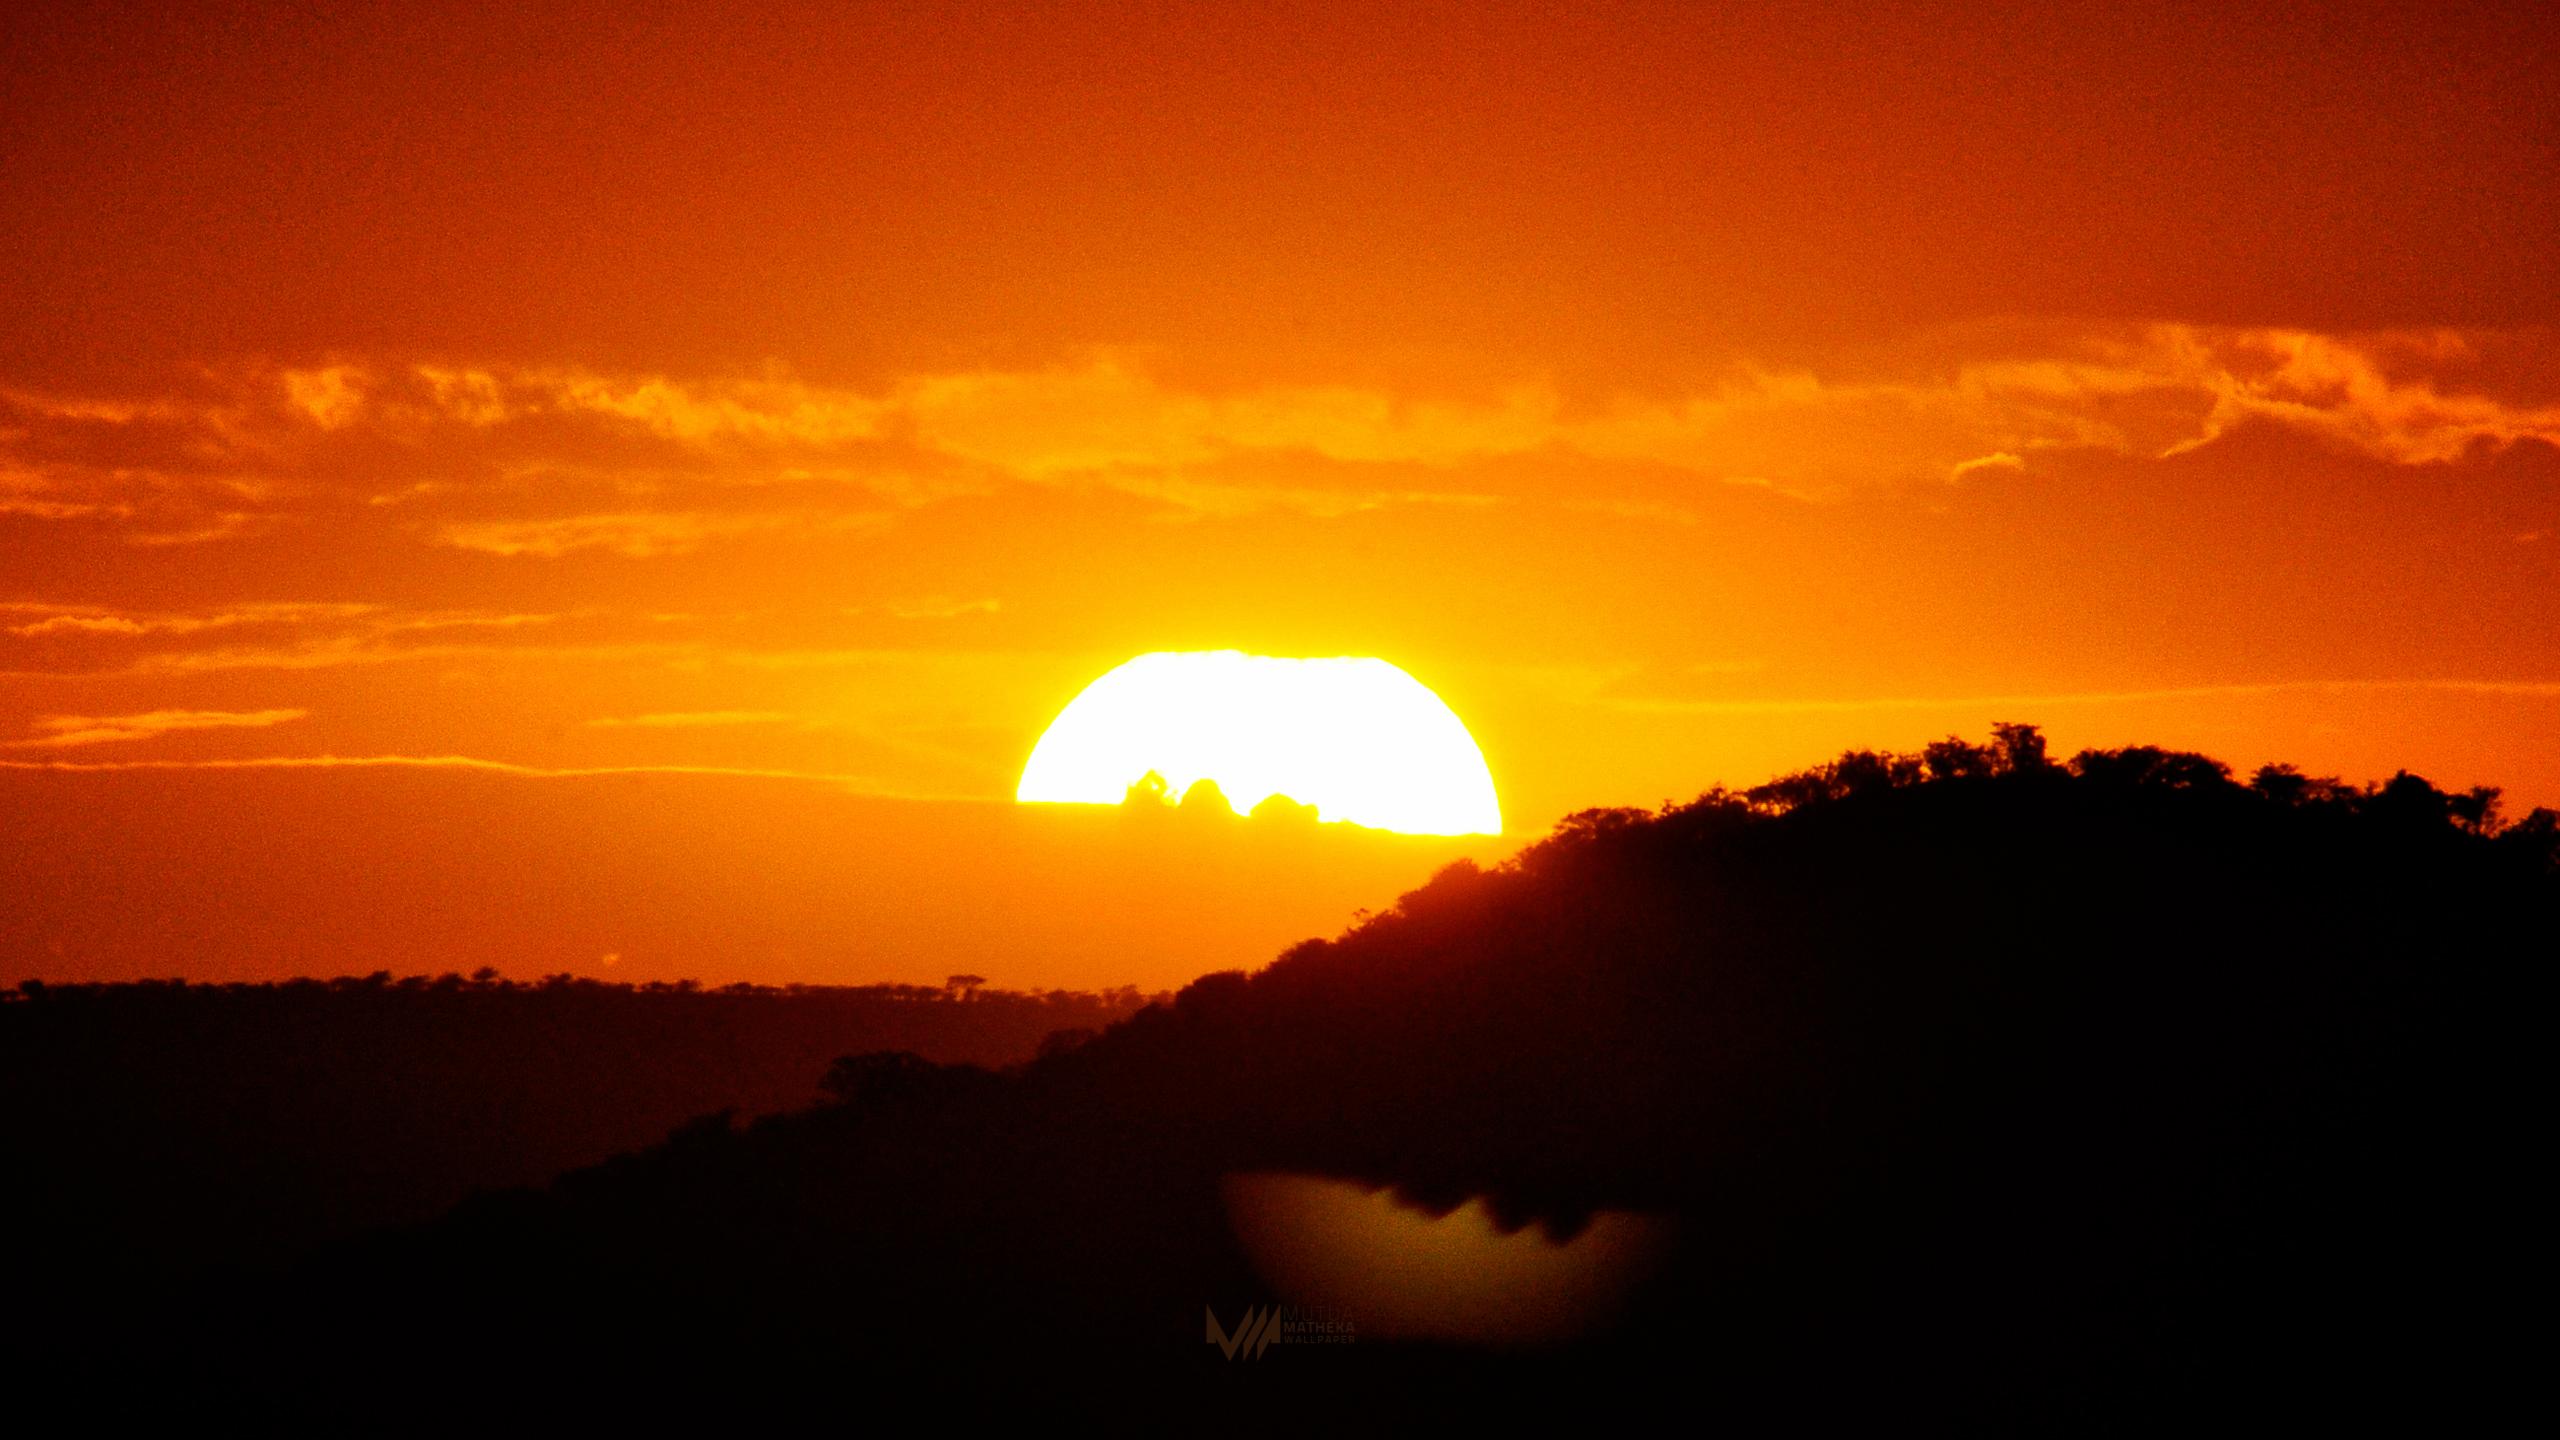 How To Make Live Wallpaper Work Iphone X Wallpaper Monday 55 Serengeti Sunset